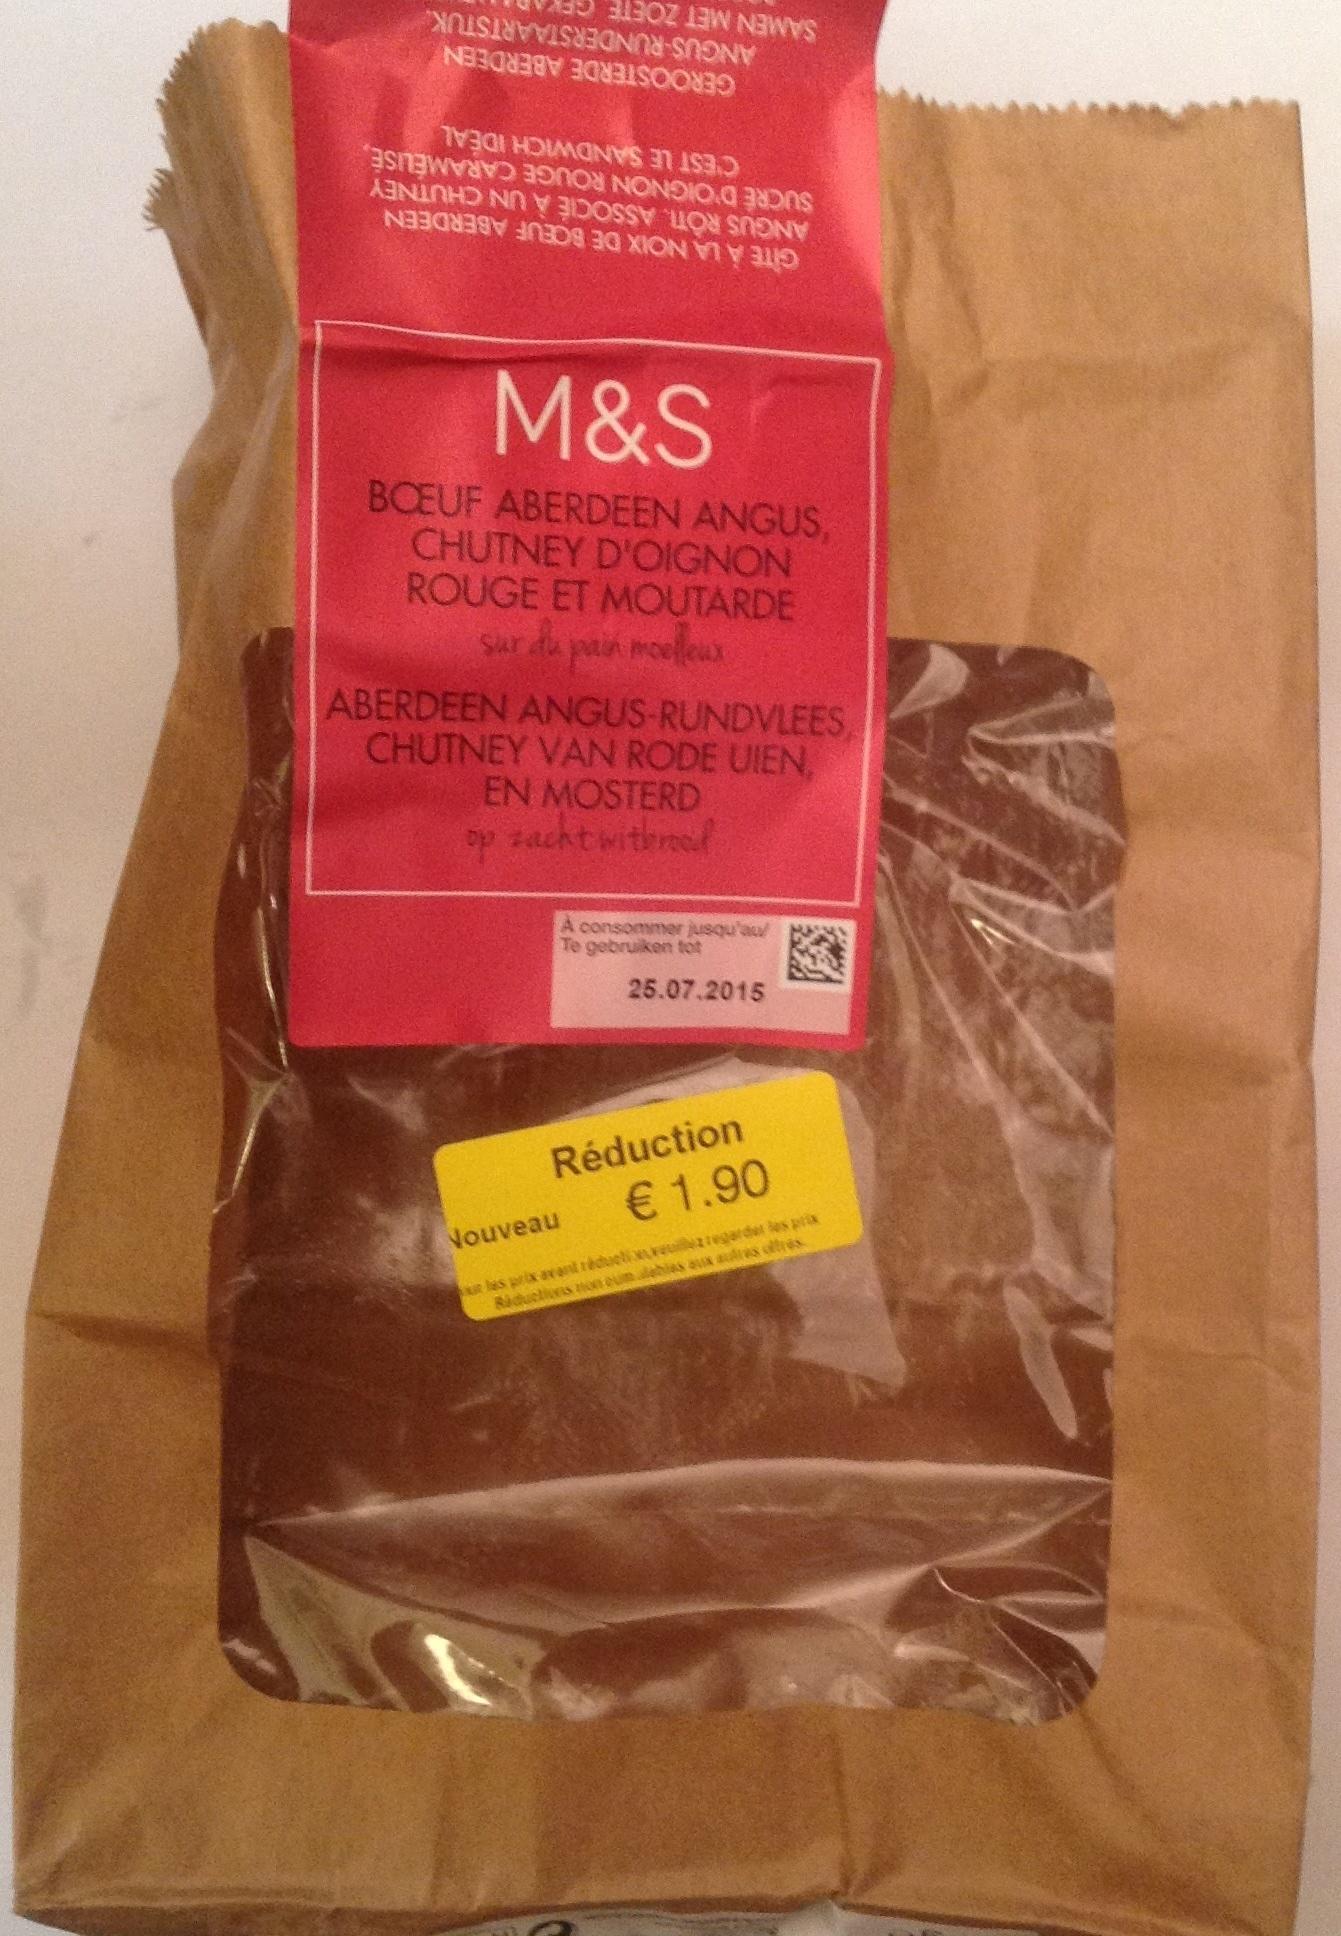 Boeuf Aberdeen Angus, Chutney d'oignon rouge et moutarde - Product - en